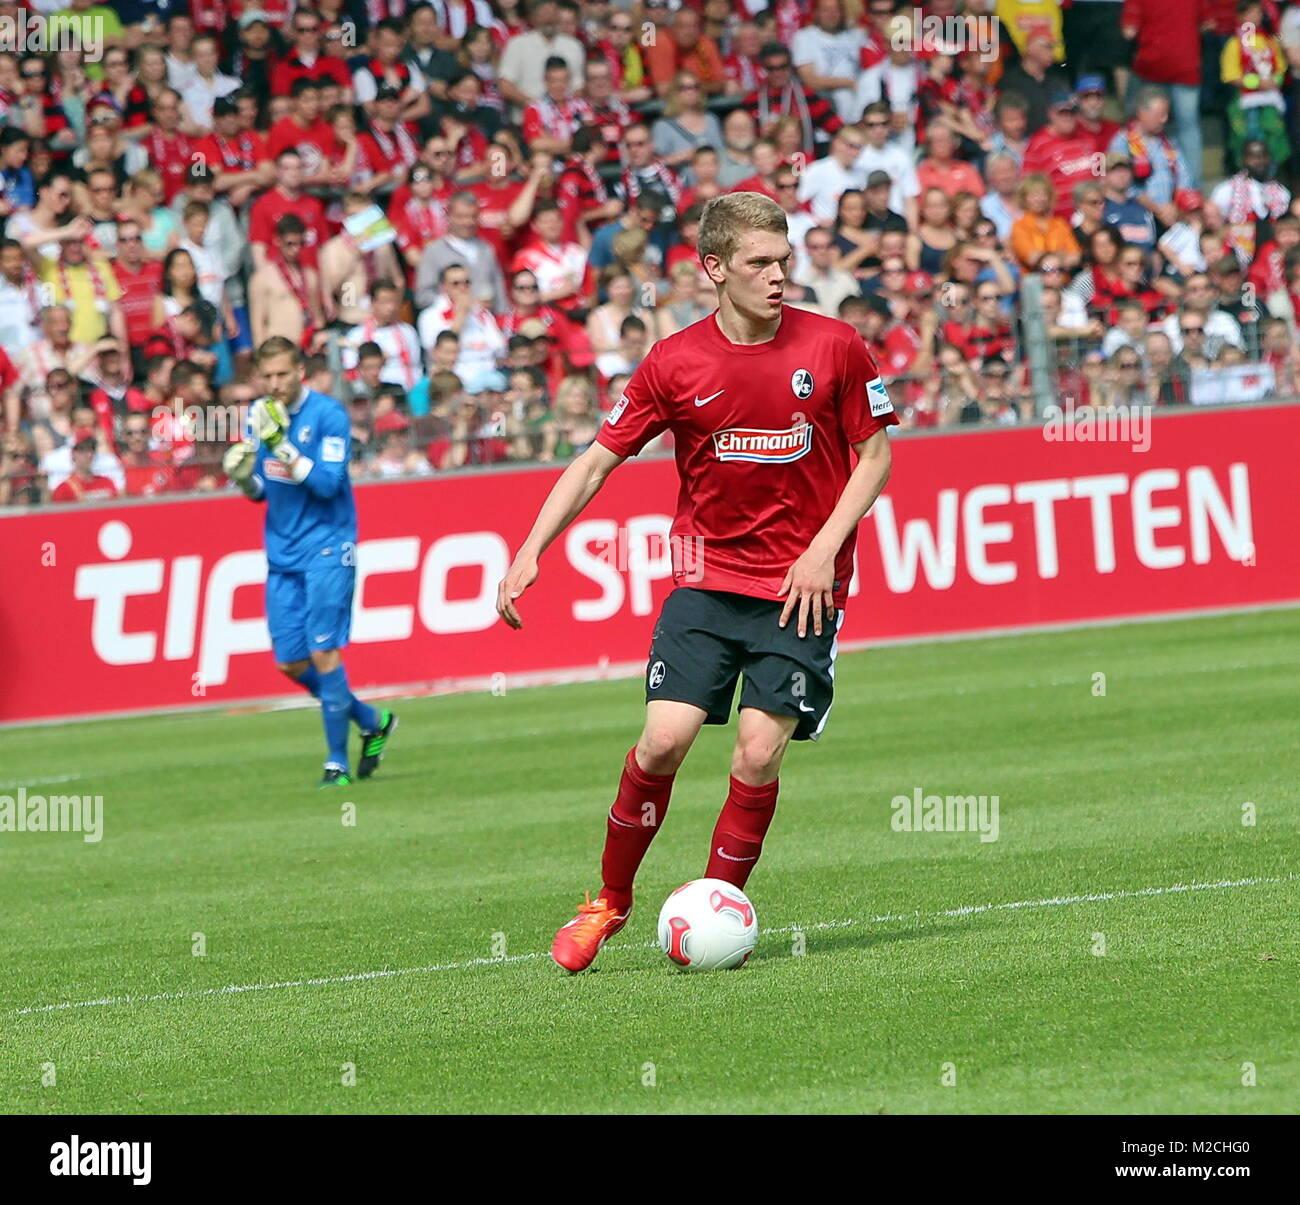 Fußball-Bundesliga: 34. Spieltag, SC Freiburg vs FC Schalke 04 - MAtthias Ginter, am Ball, SC Freiburg - Stock Image